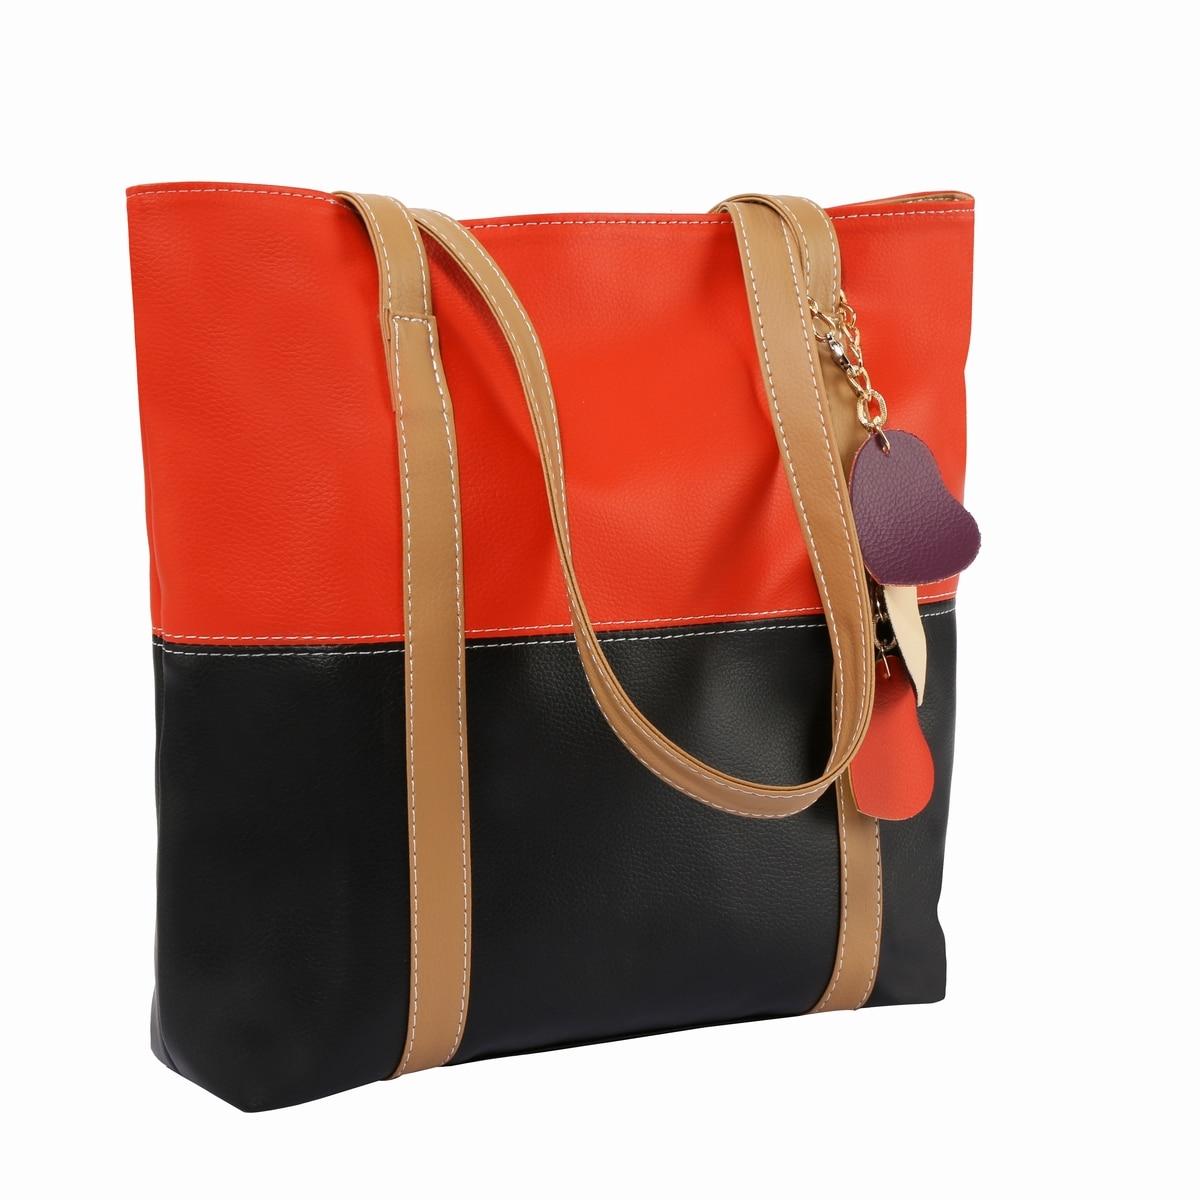 sac a principal bolsa bolsos Size : 38cm*10cm*31cm